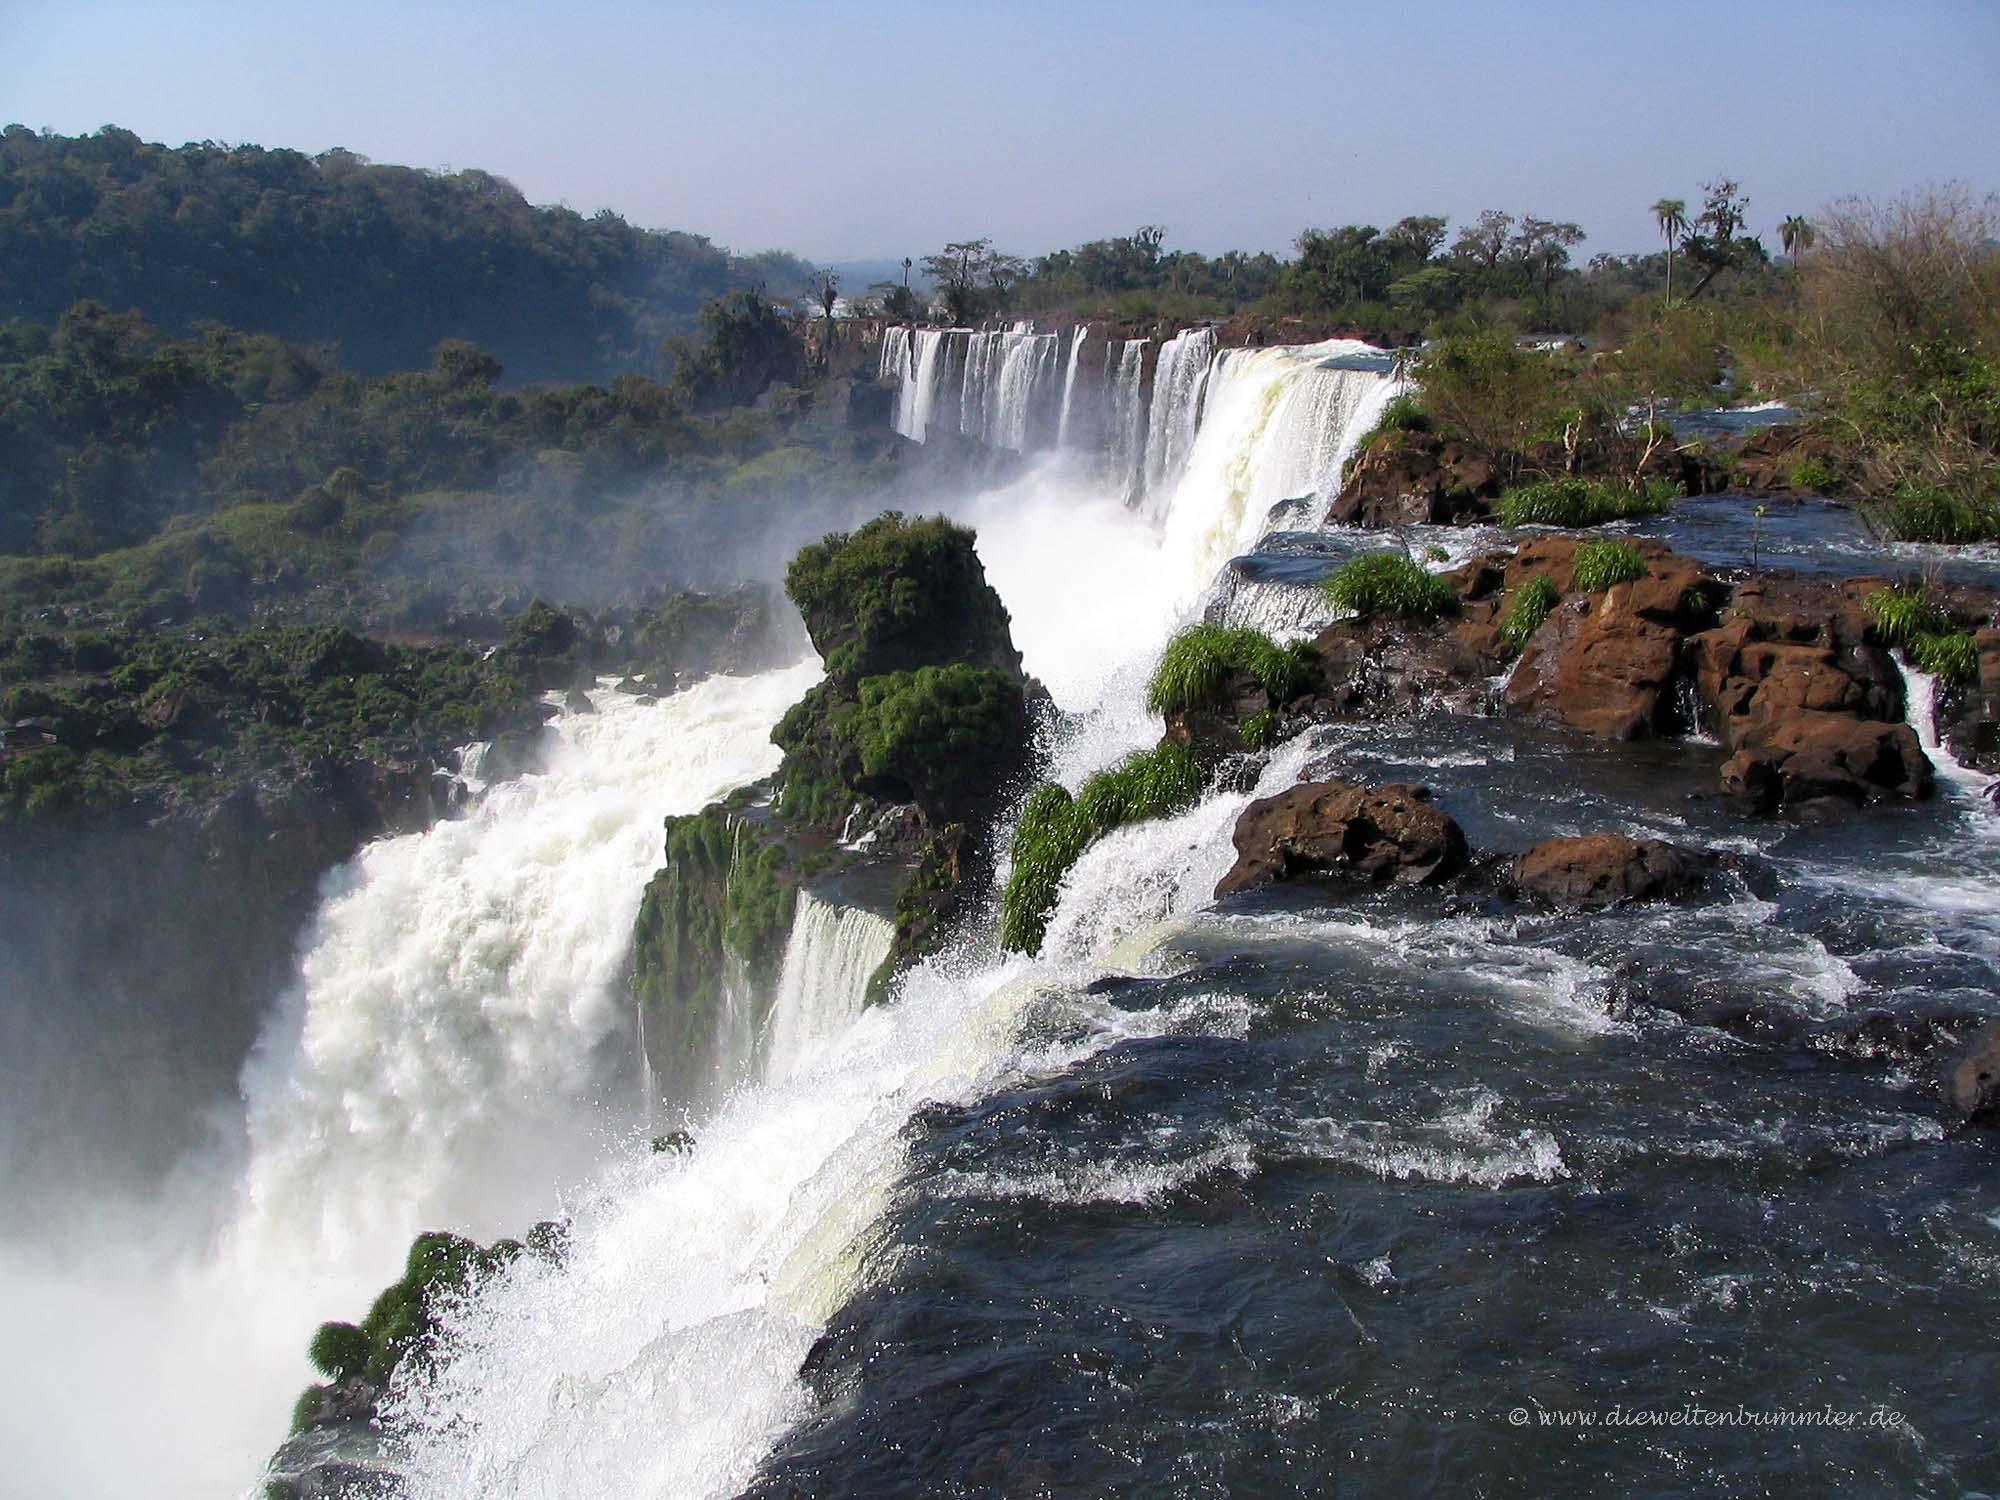 Wasserfall in Iguazu